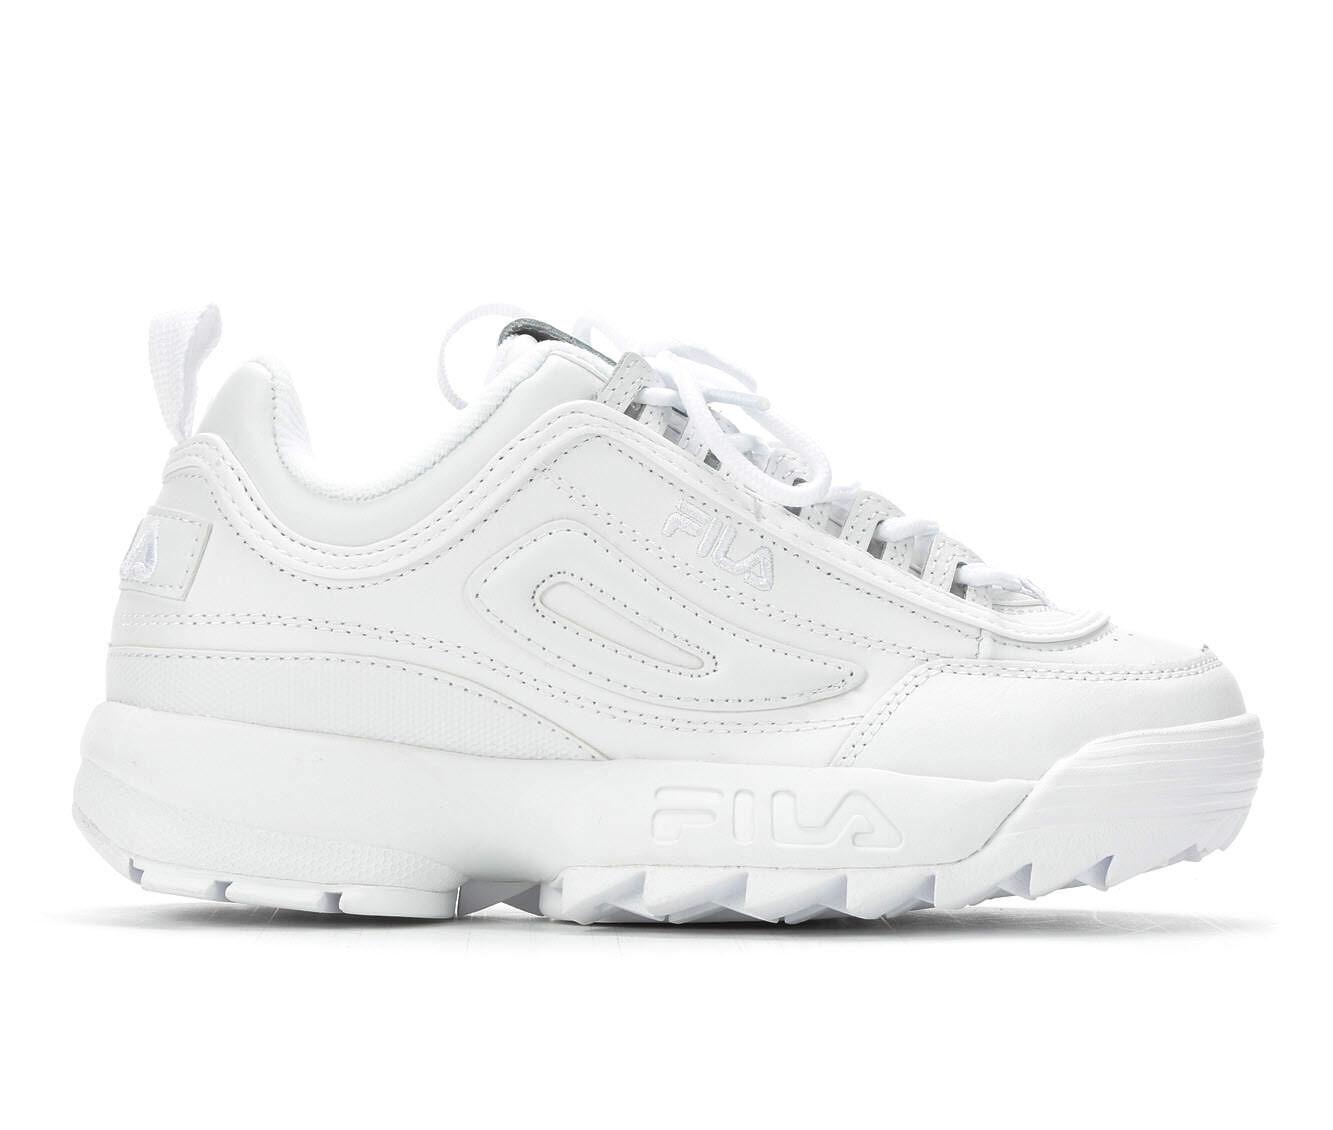 Women's Fila Disruptor II Premium Sneakers White/White